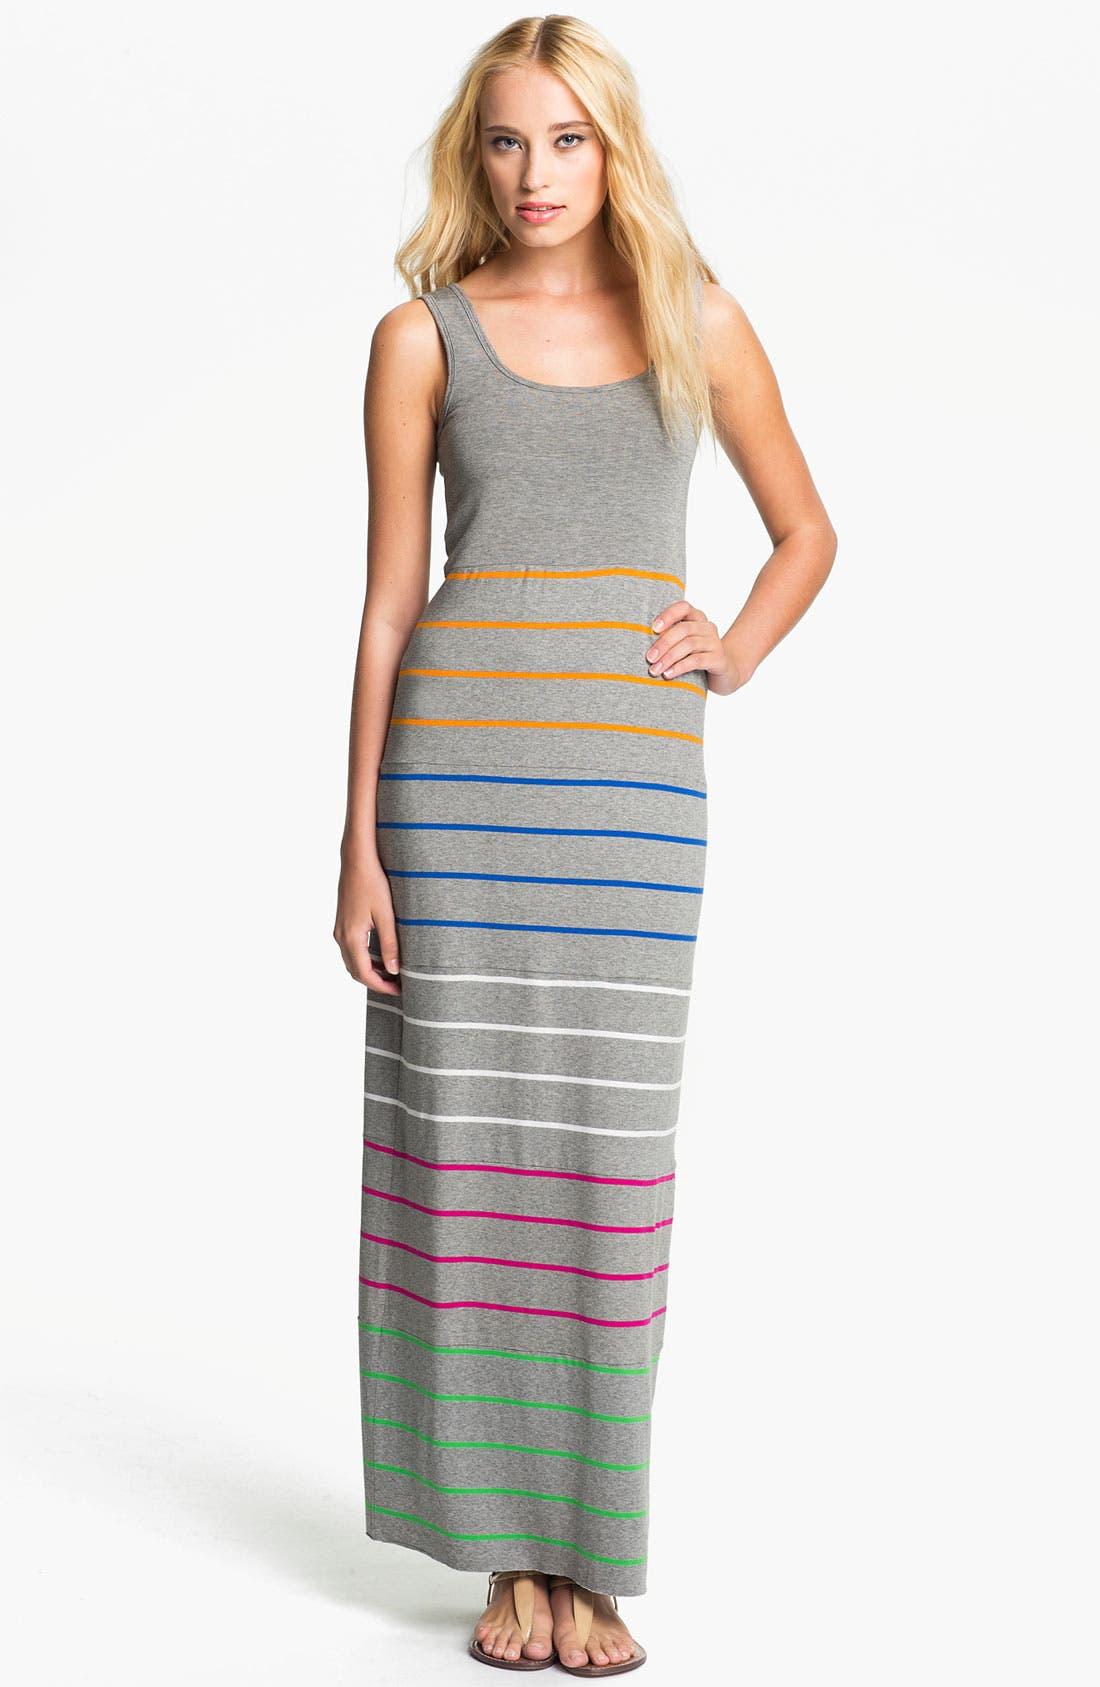 Alternate Image 1 Selected - Bailey 44 'Endurance' Stripe Maxi Dress